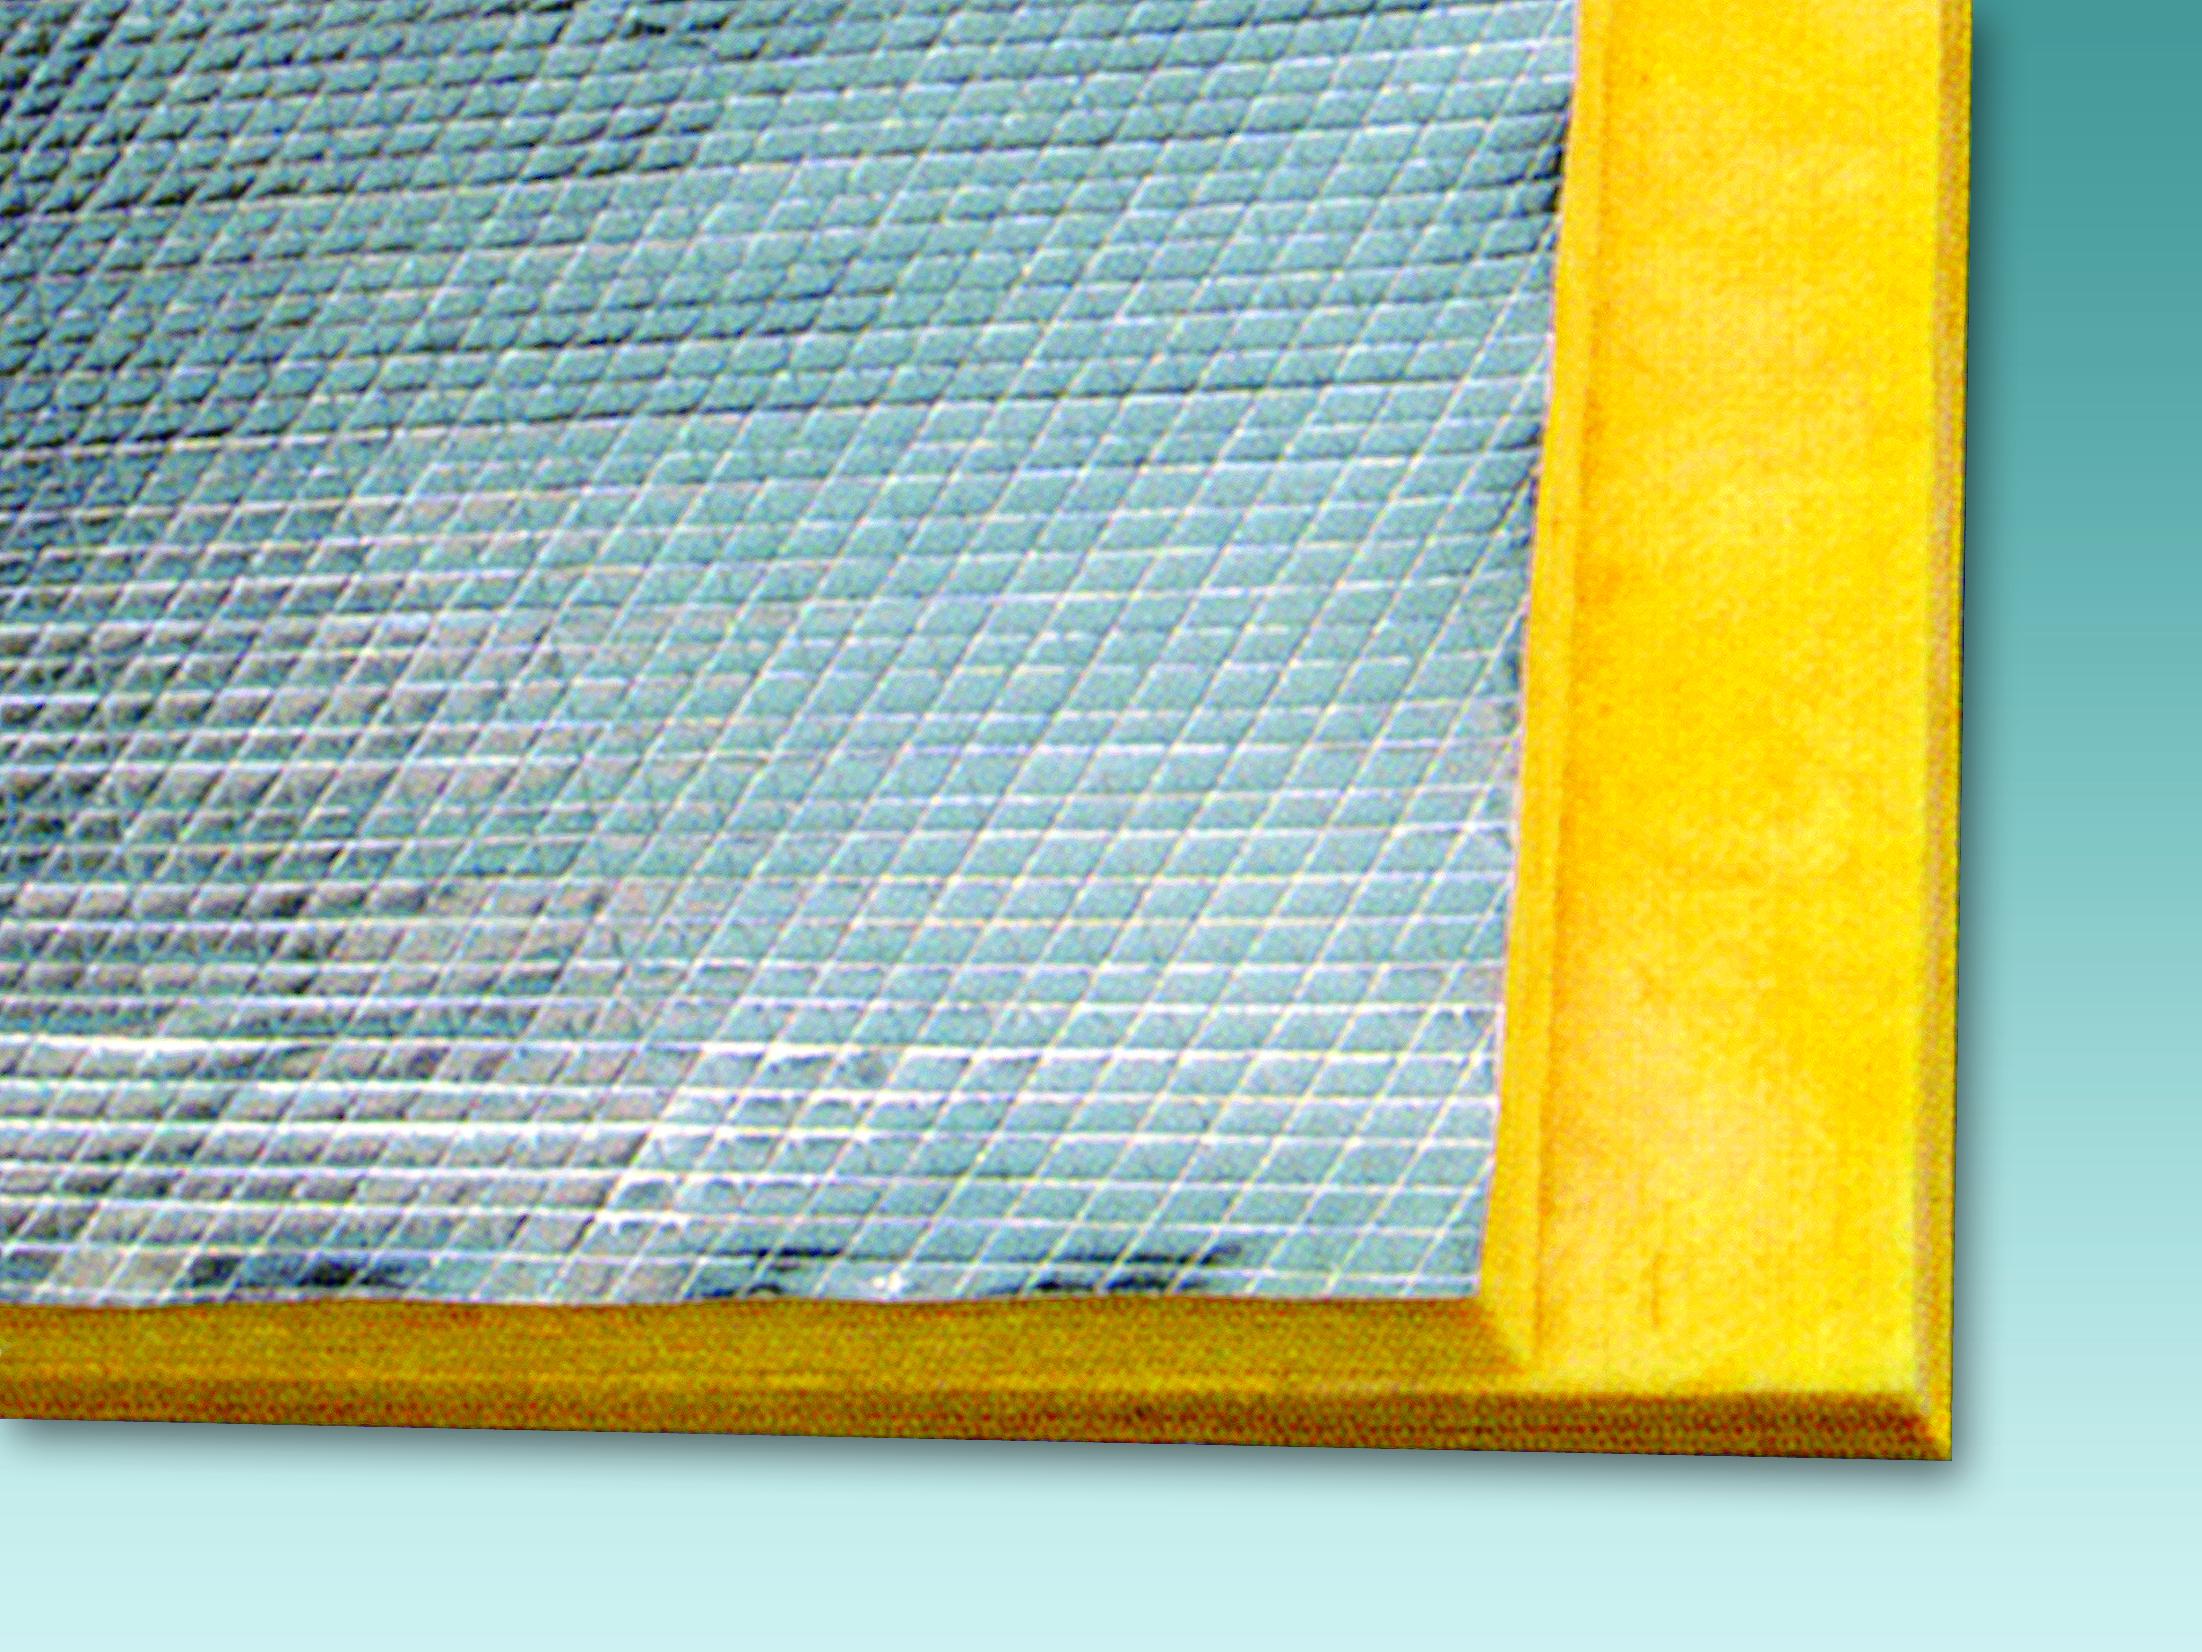 Buy Fiber Glass Wool For Insulation Glass Wool Board Price